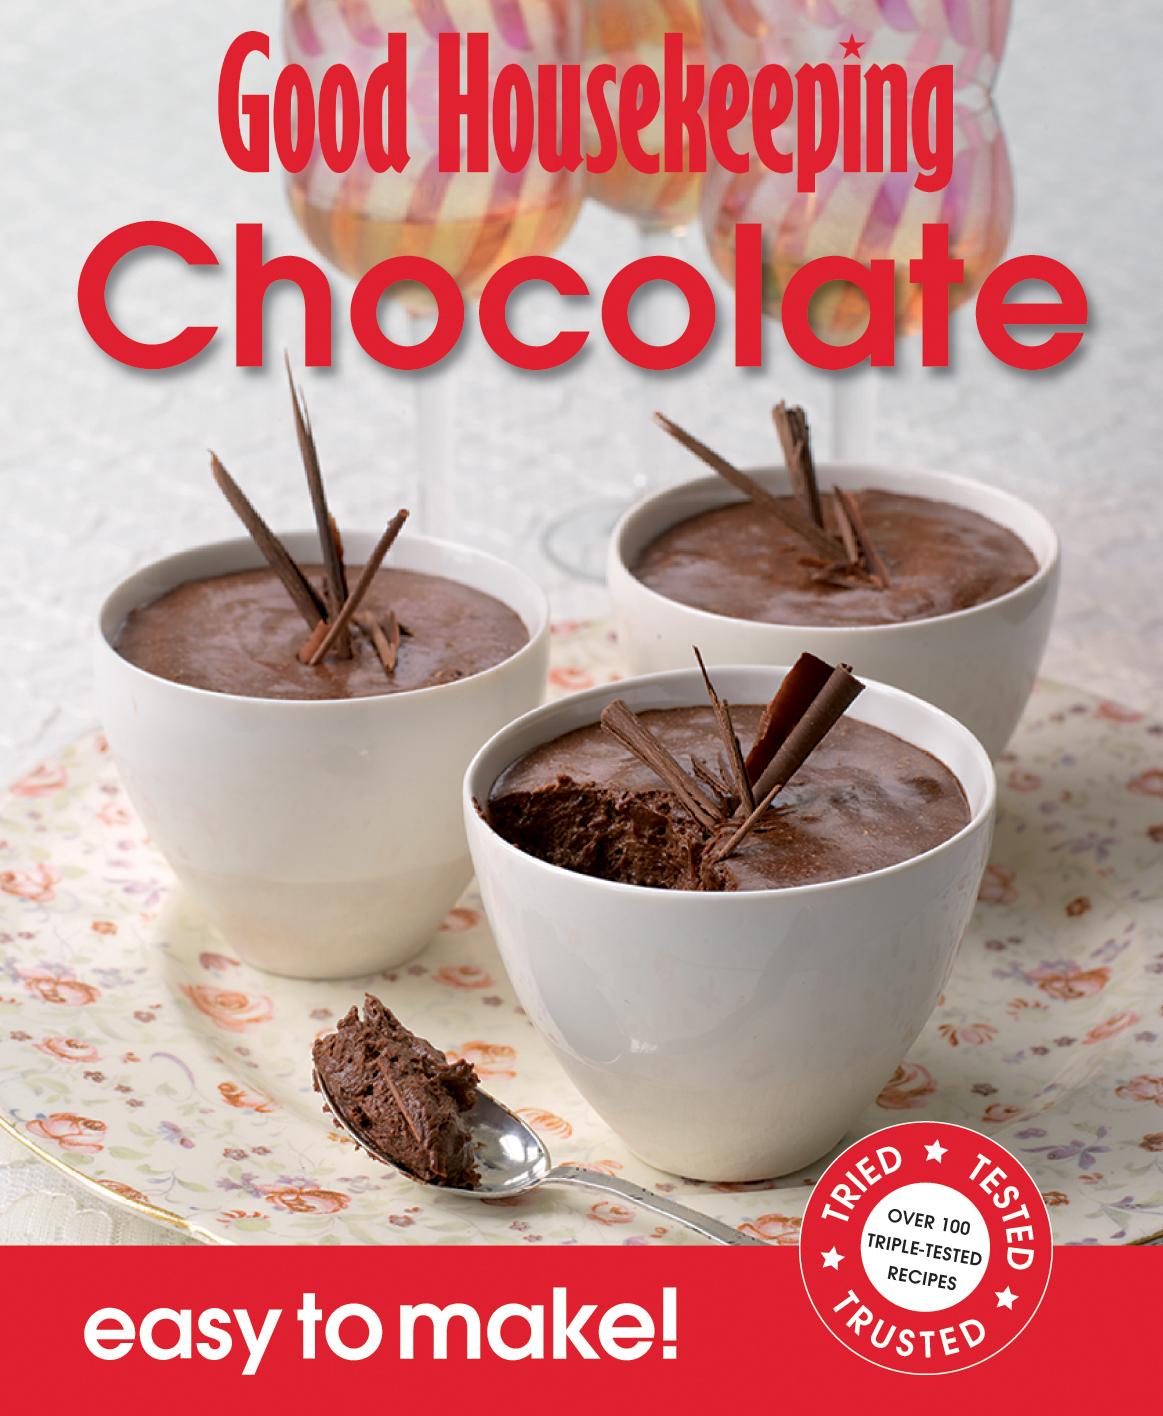 Good Housekeeping Easy to Make! Chocolate